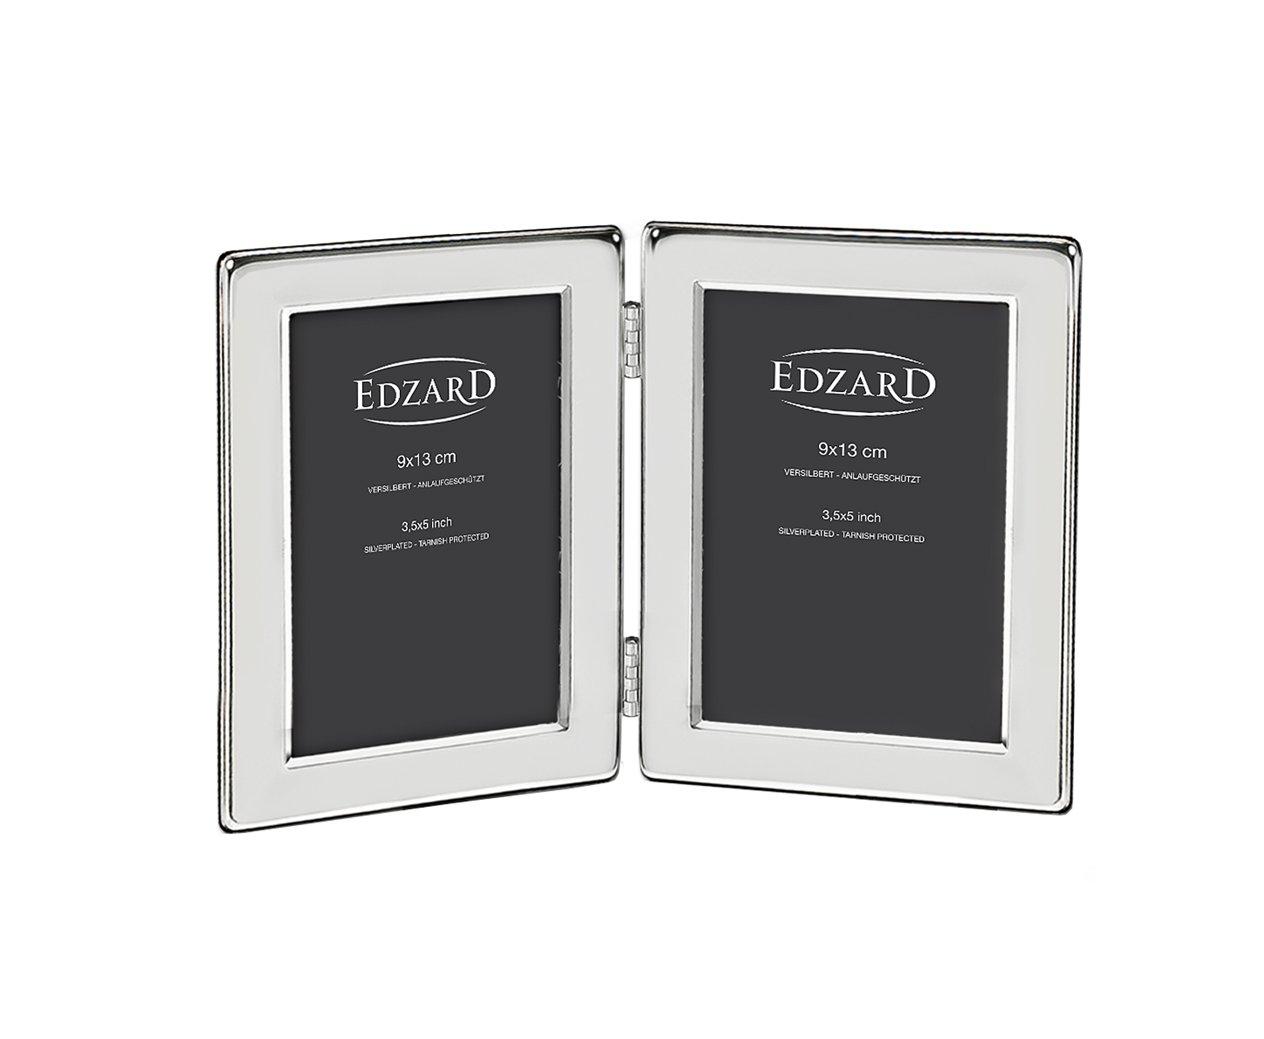 EDZARD Doppel-Fotorahmen Salerno, edel versilbert, anlaufgeschützt ...